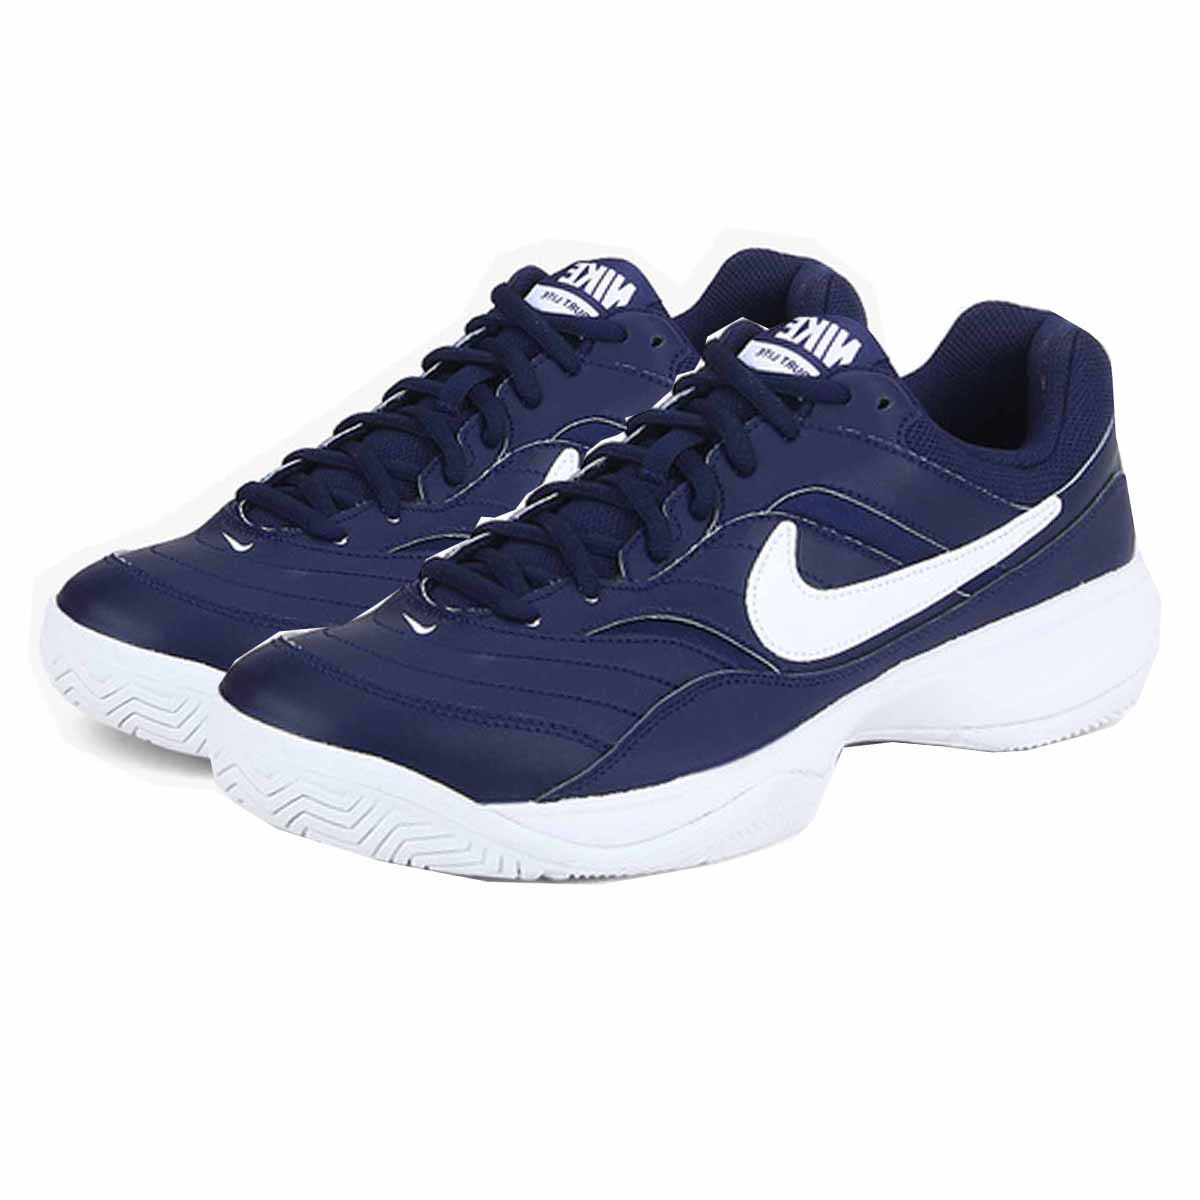 b394329c Nike Court Lite Tennis Shoes (Blue/White)